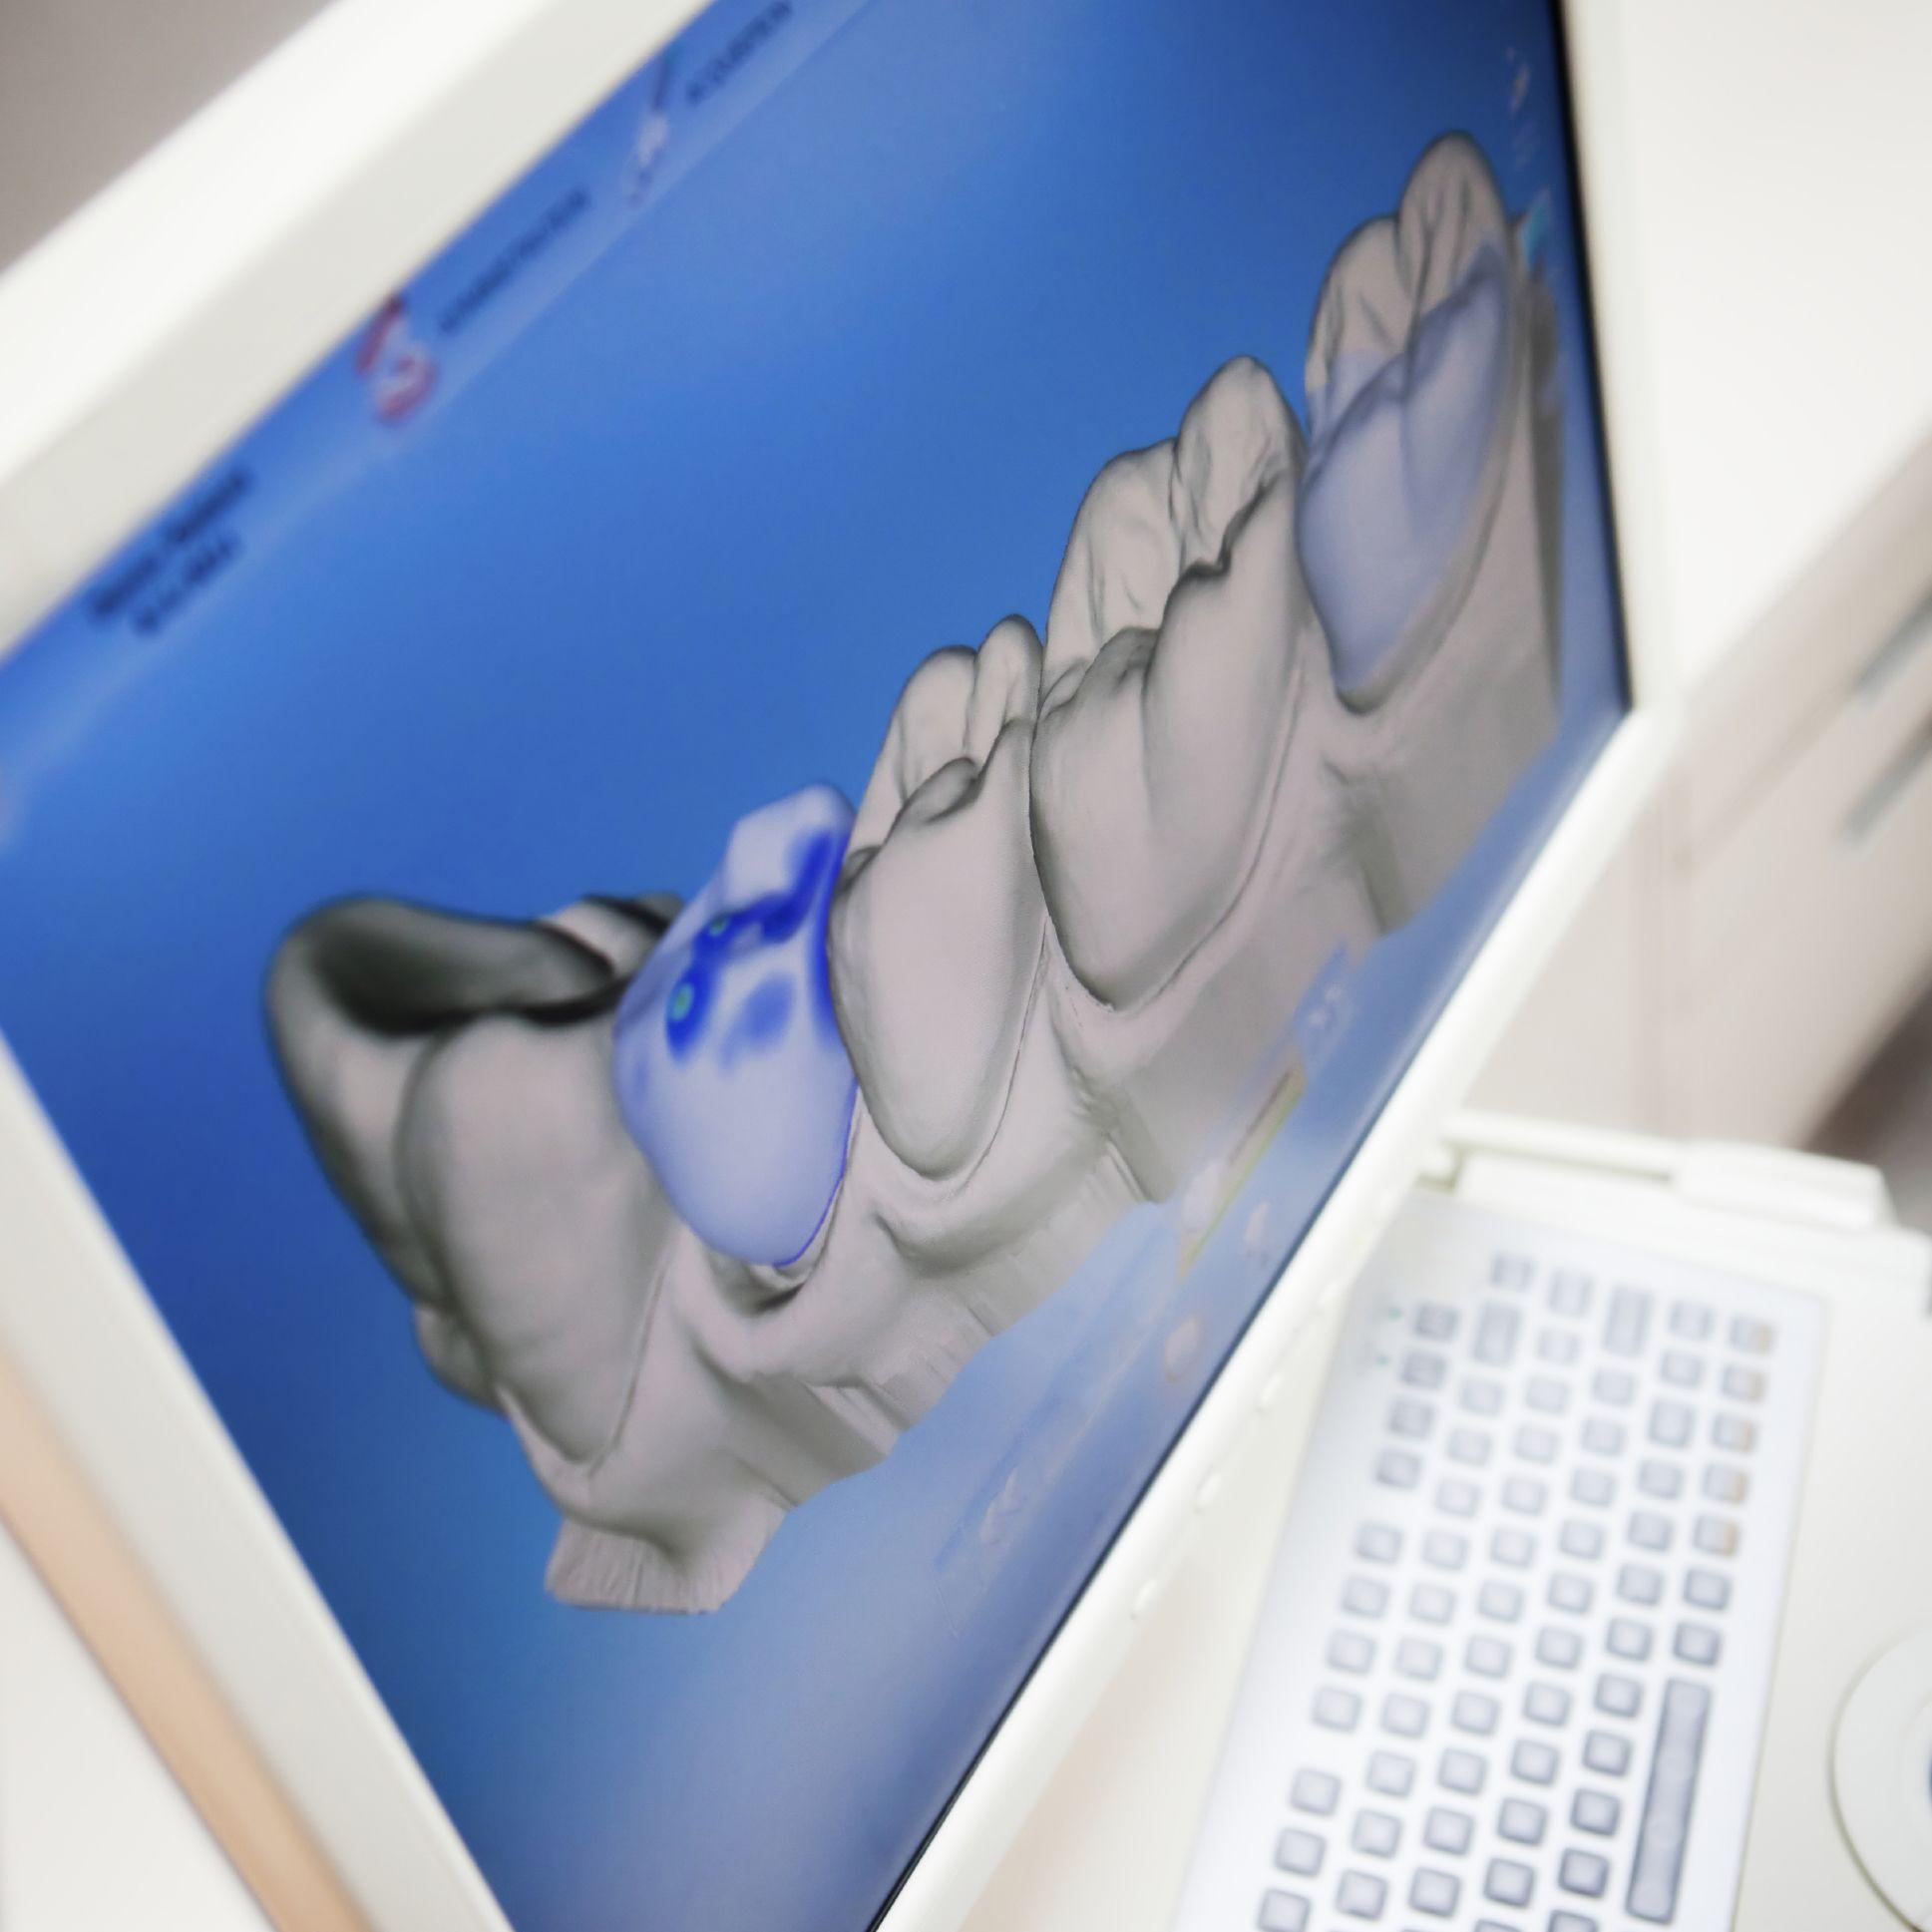 Smile design imaging technology